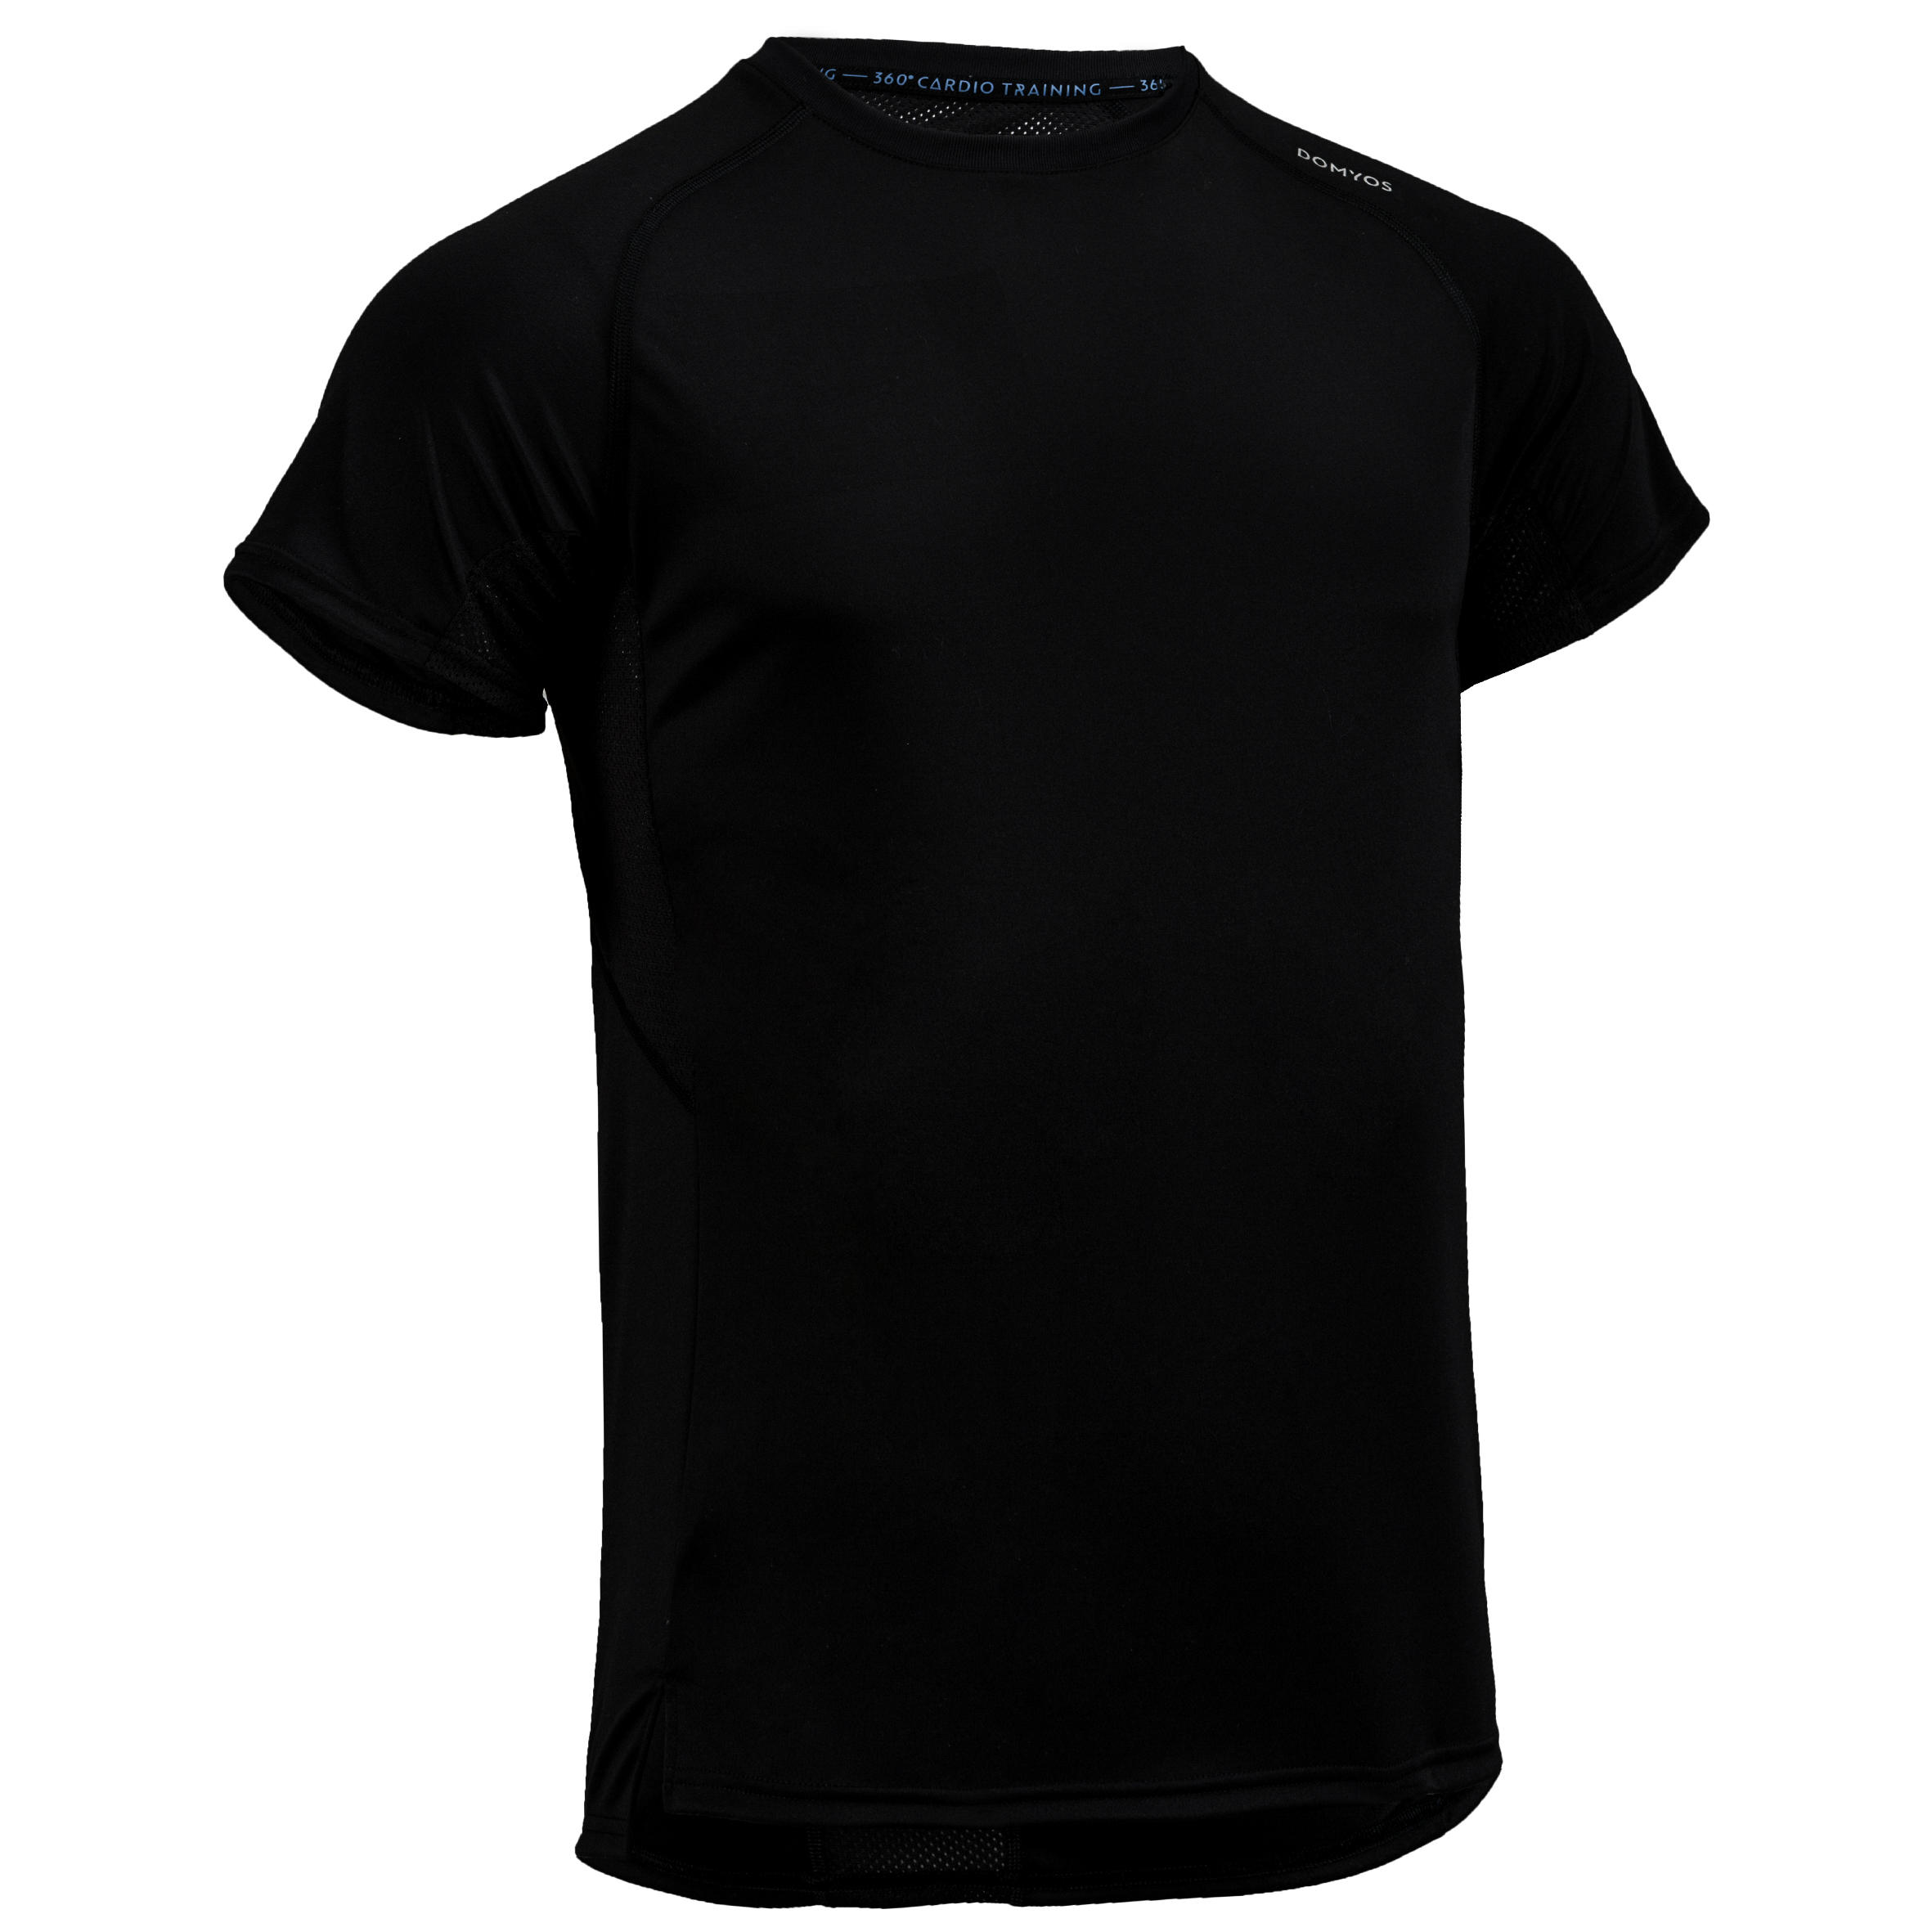 FTS 120 Cardio Fitness T-Shirt - Plain Black